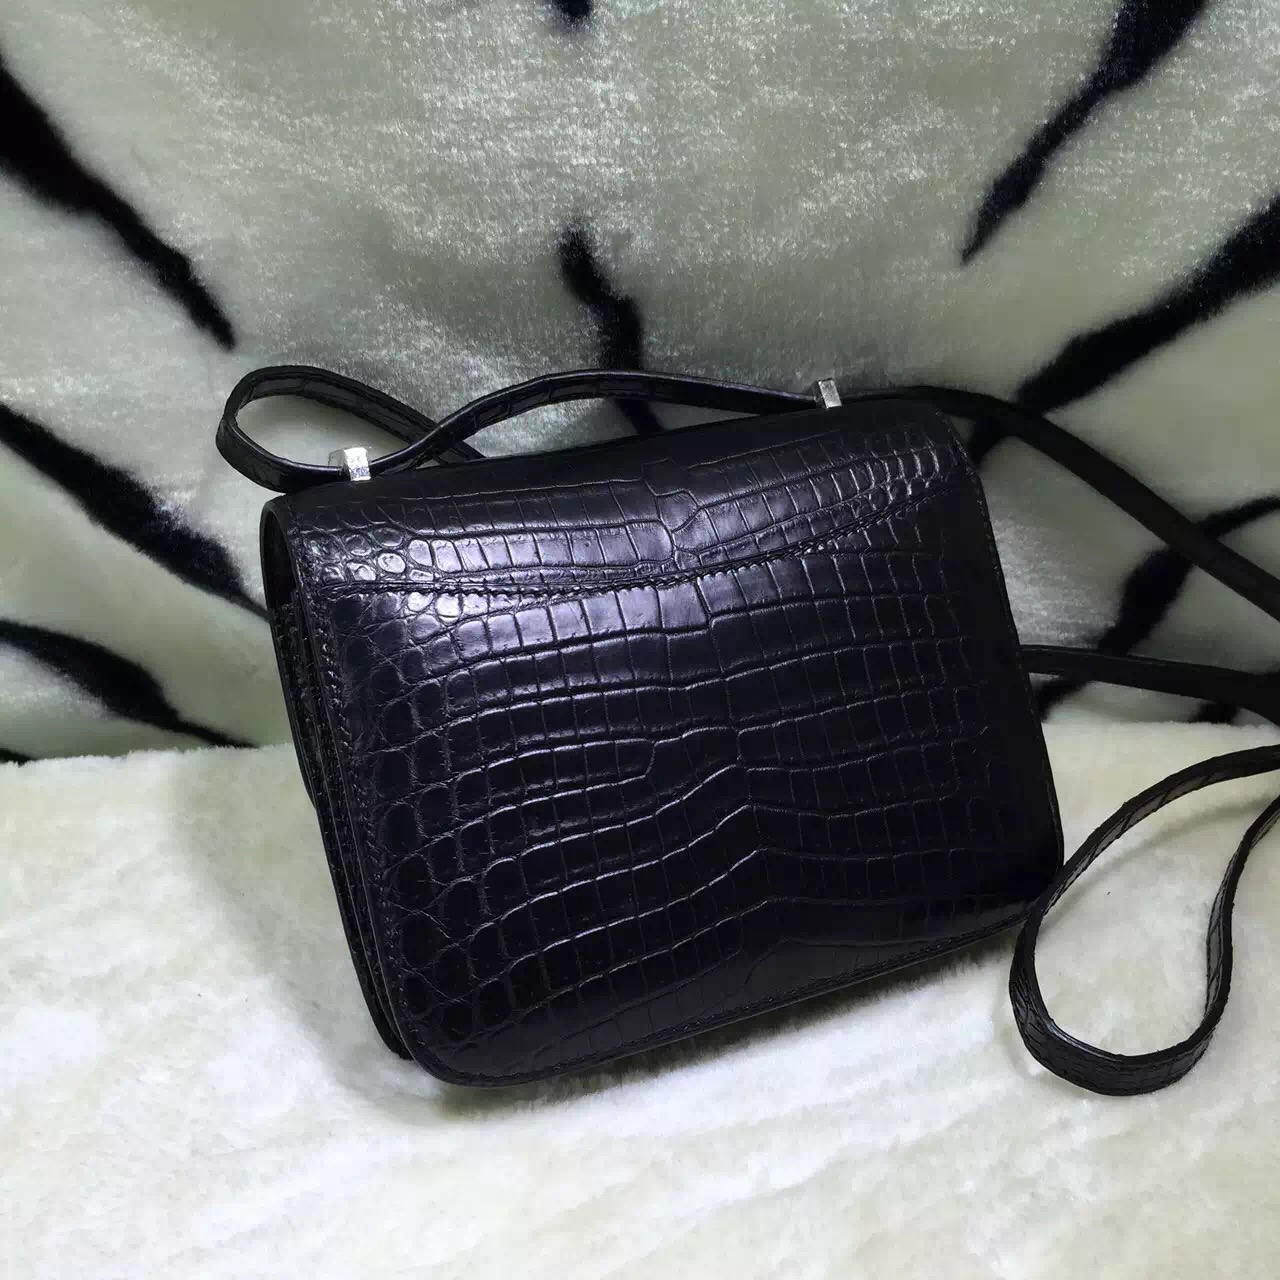 Fashion Women's Cross-body Bag Hermes Constance Bag 19CM CK89 Black Crocodile Skin